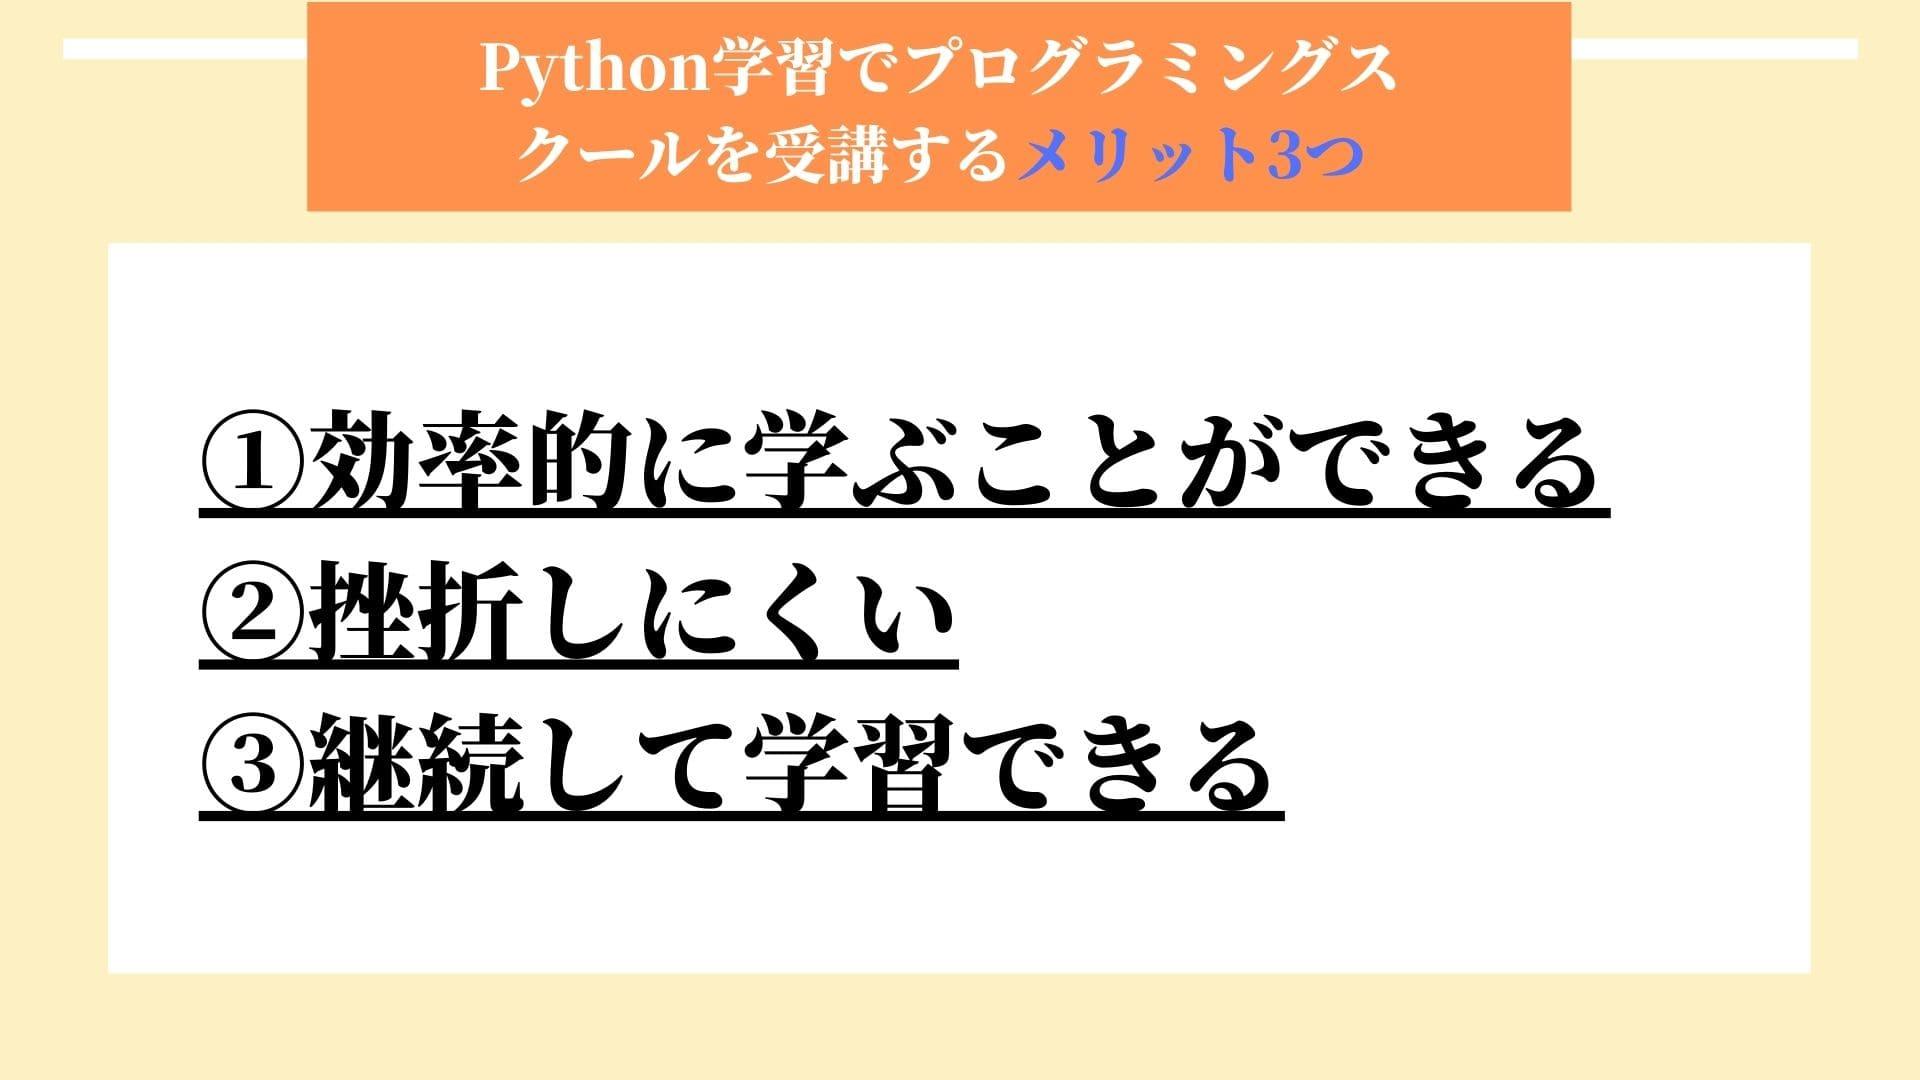 Python プログラミングスクール メリット